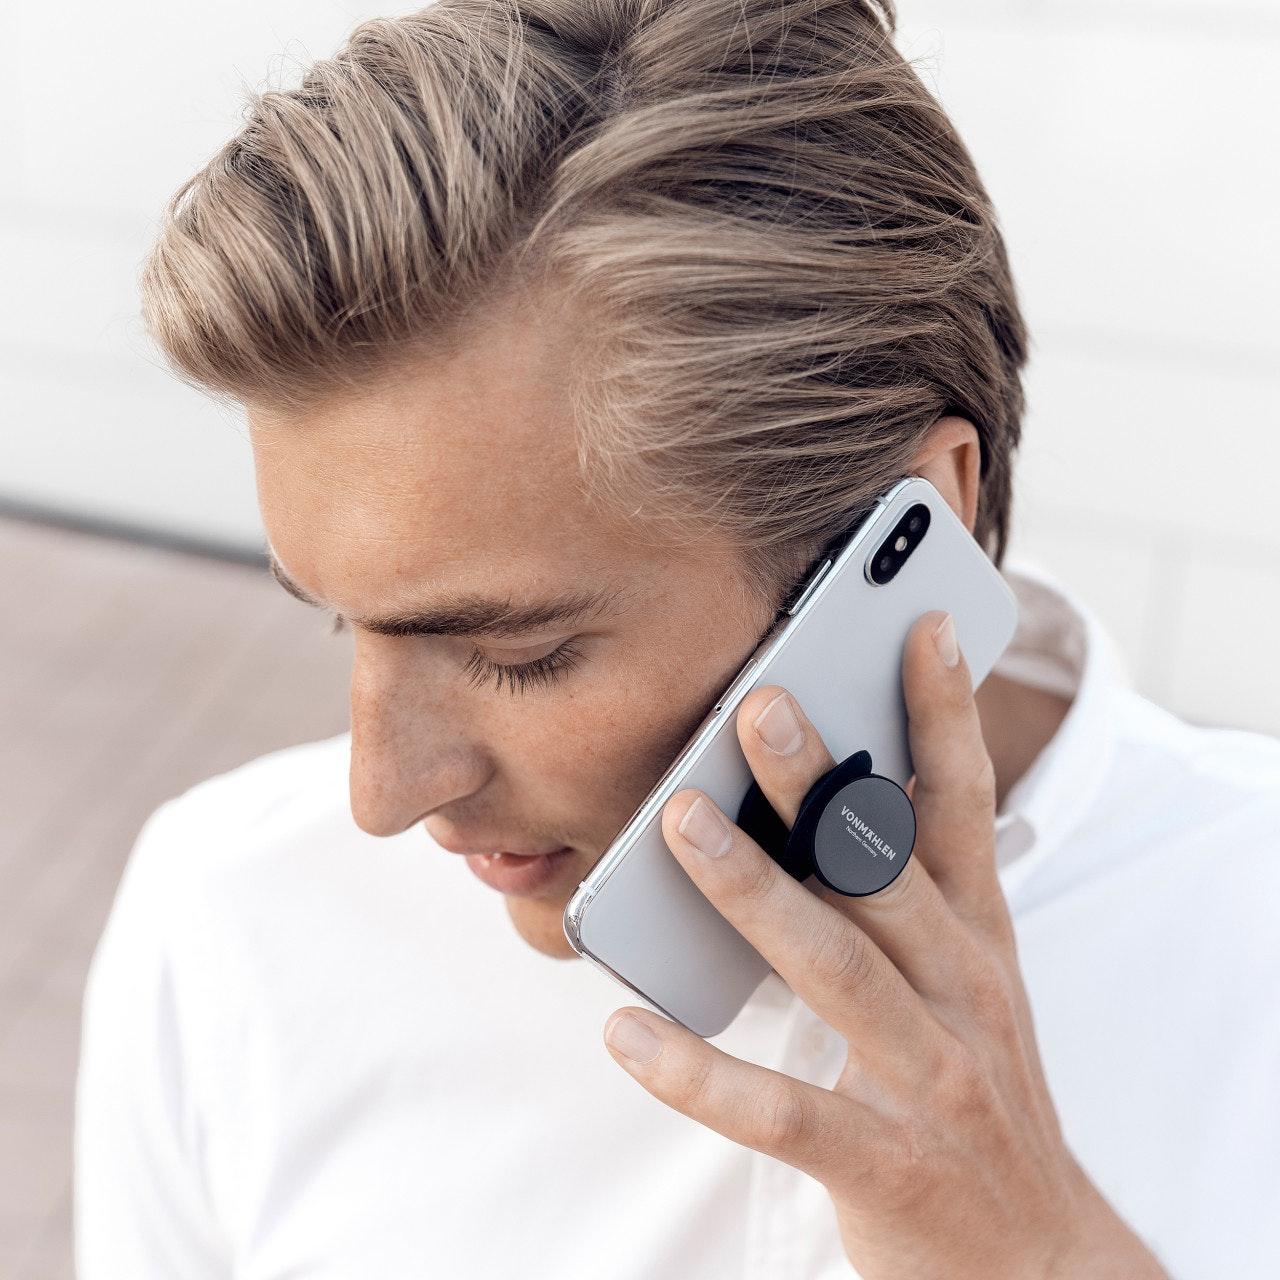 Backflip® Signature - The Phone Grip